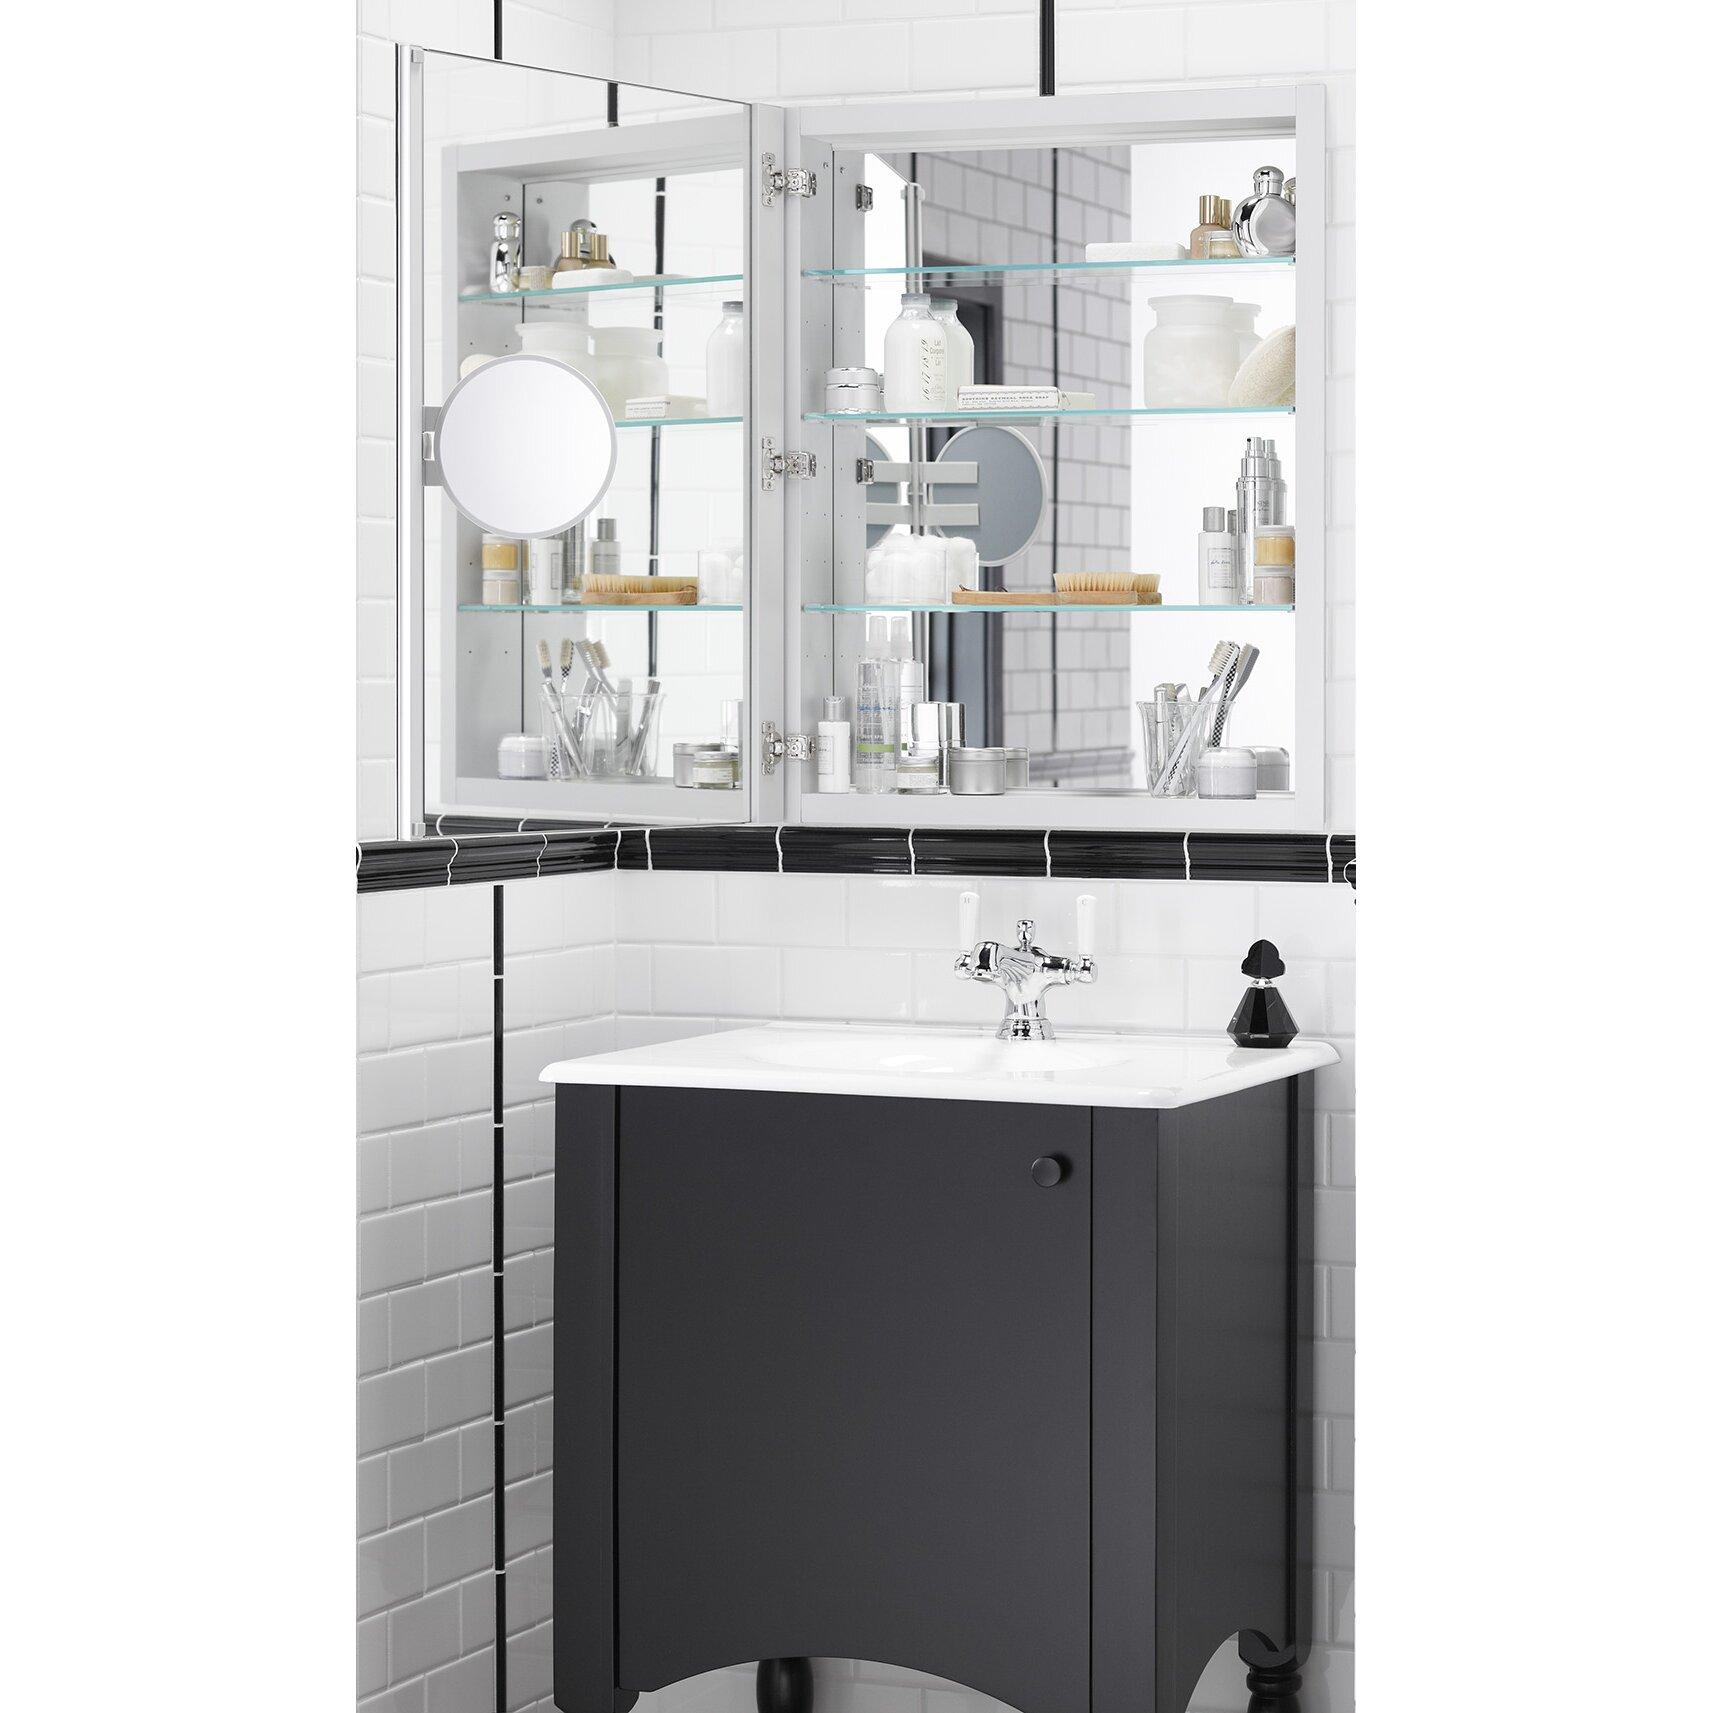 30 h medicine cabinet with adjustable magnifying mirror by kohler